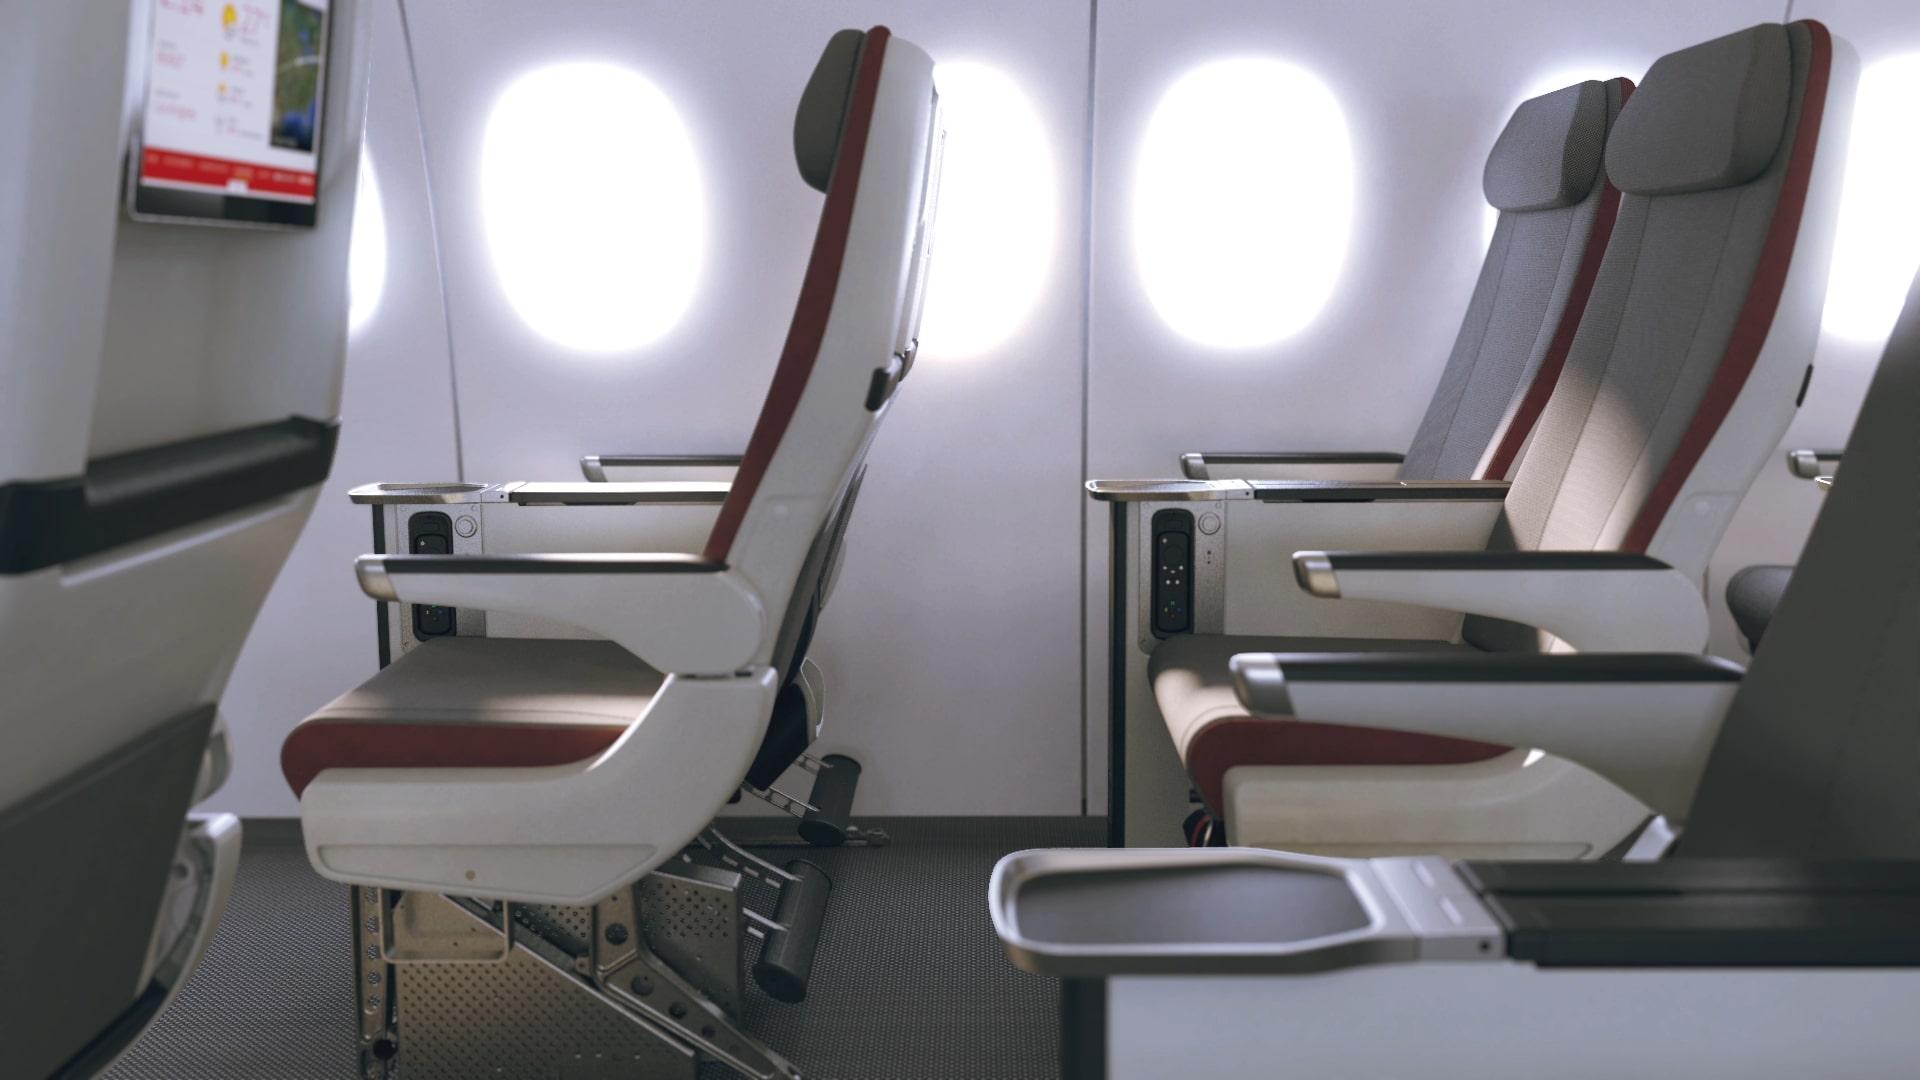 que-es-el-pitch-separacion-filas-cabina-pasajeros-turista-premium-iberia